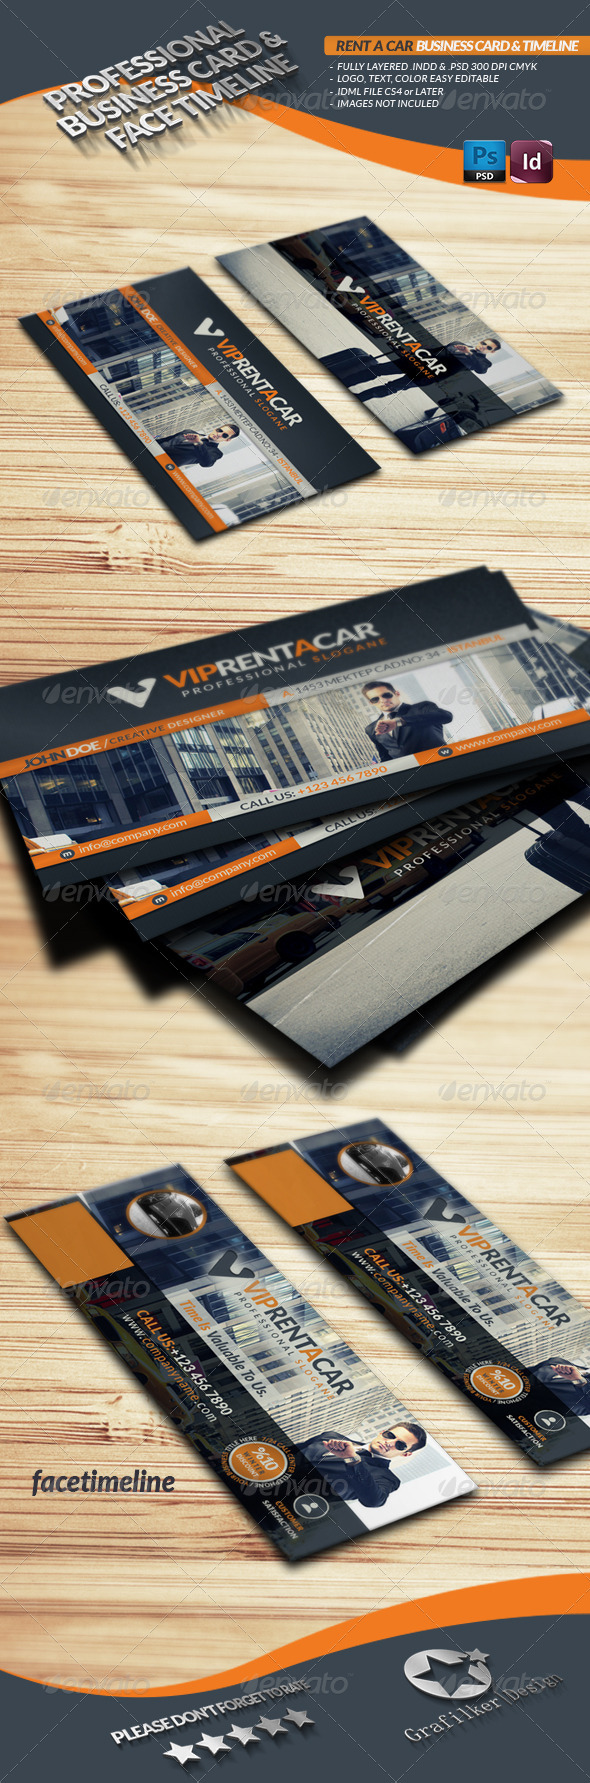 Rent a car business card graphics designs templates magicingreecefo Gallery